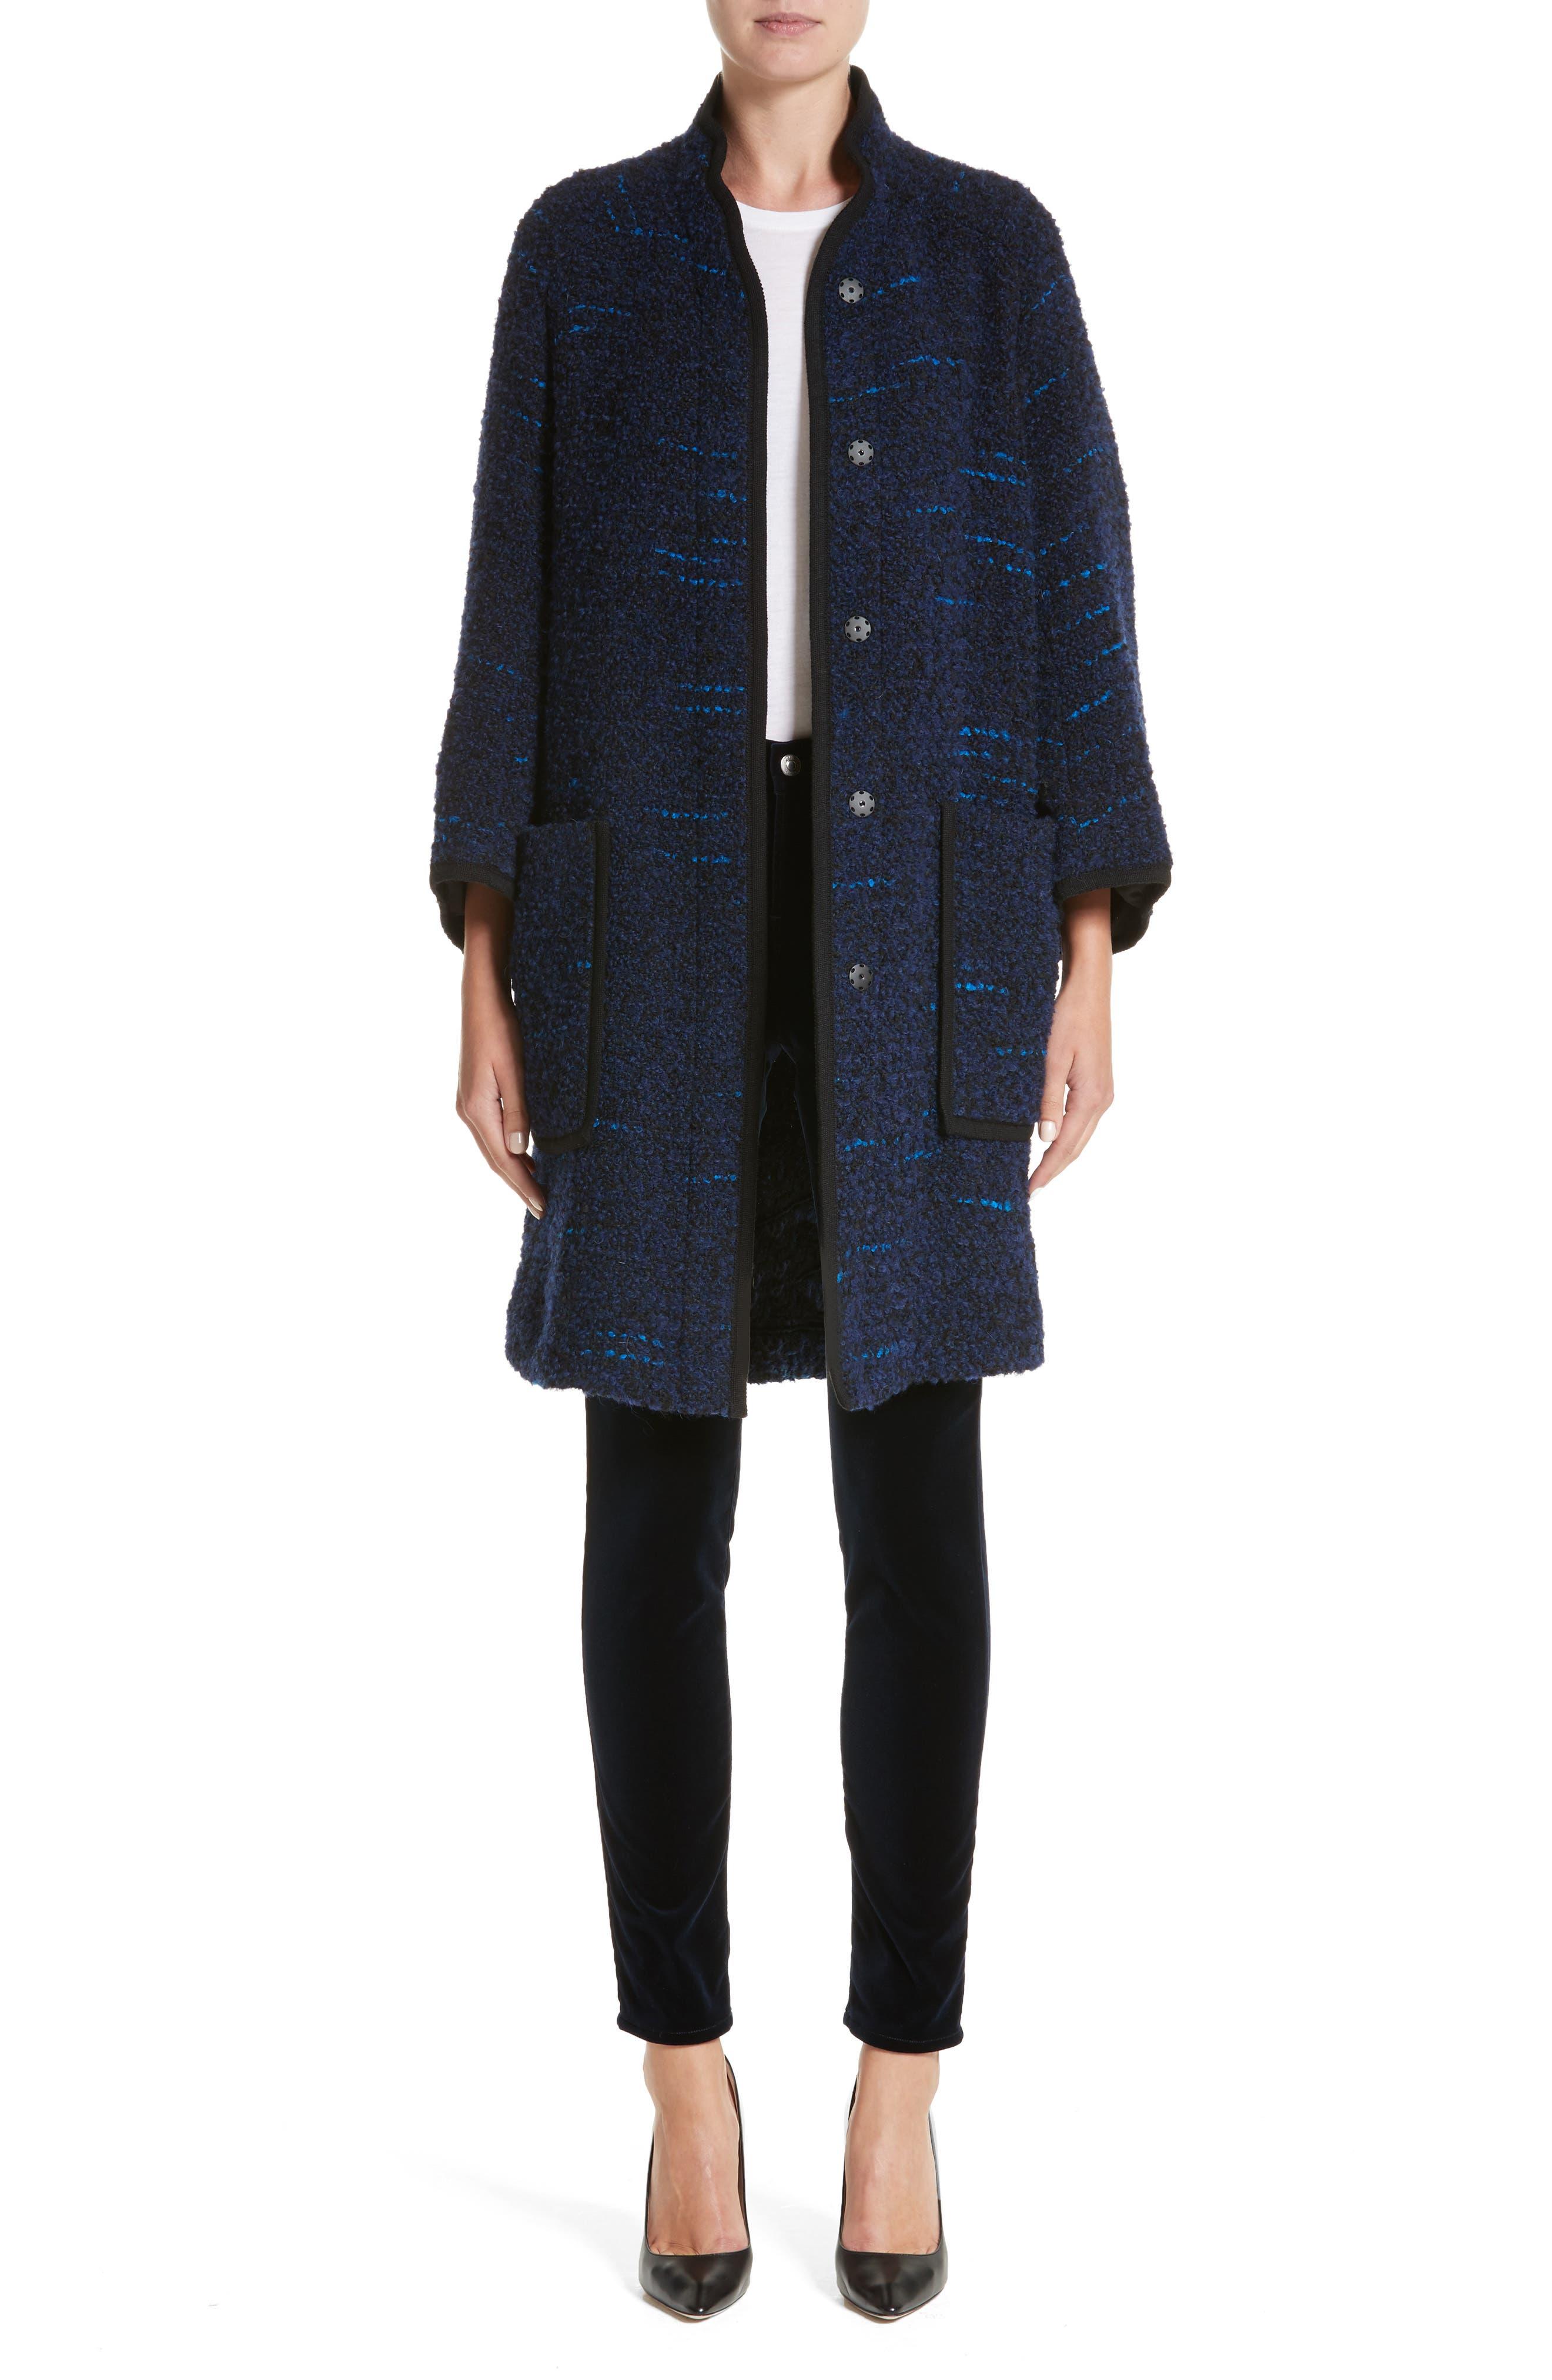 Wool Blend Swing Coat,                             Alternate thumbnail 7, color,                             Navy / Blue Multi